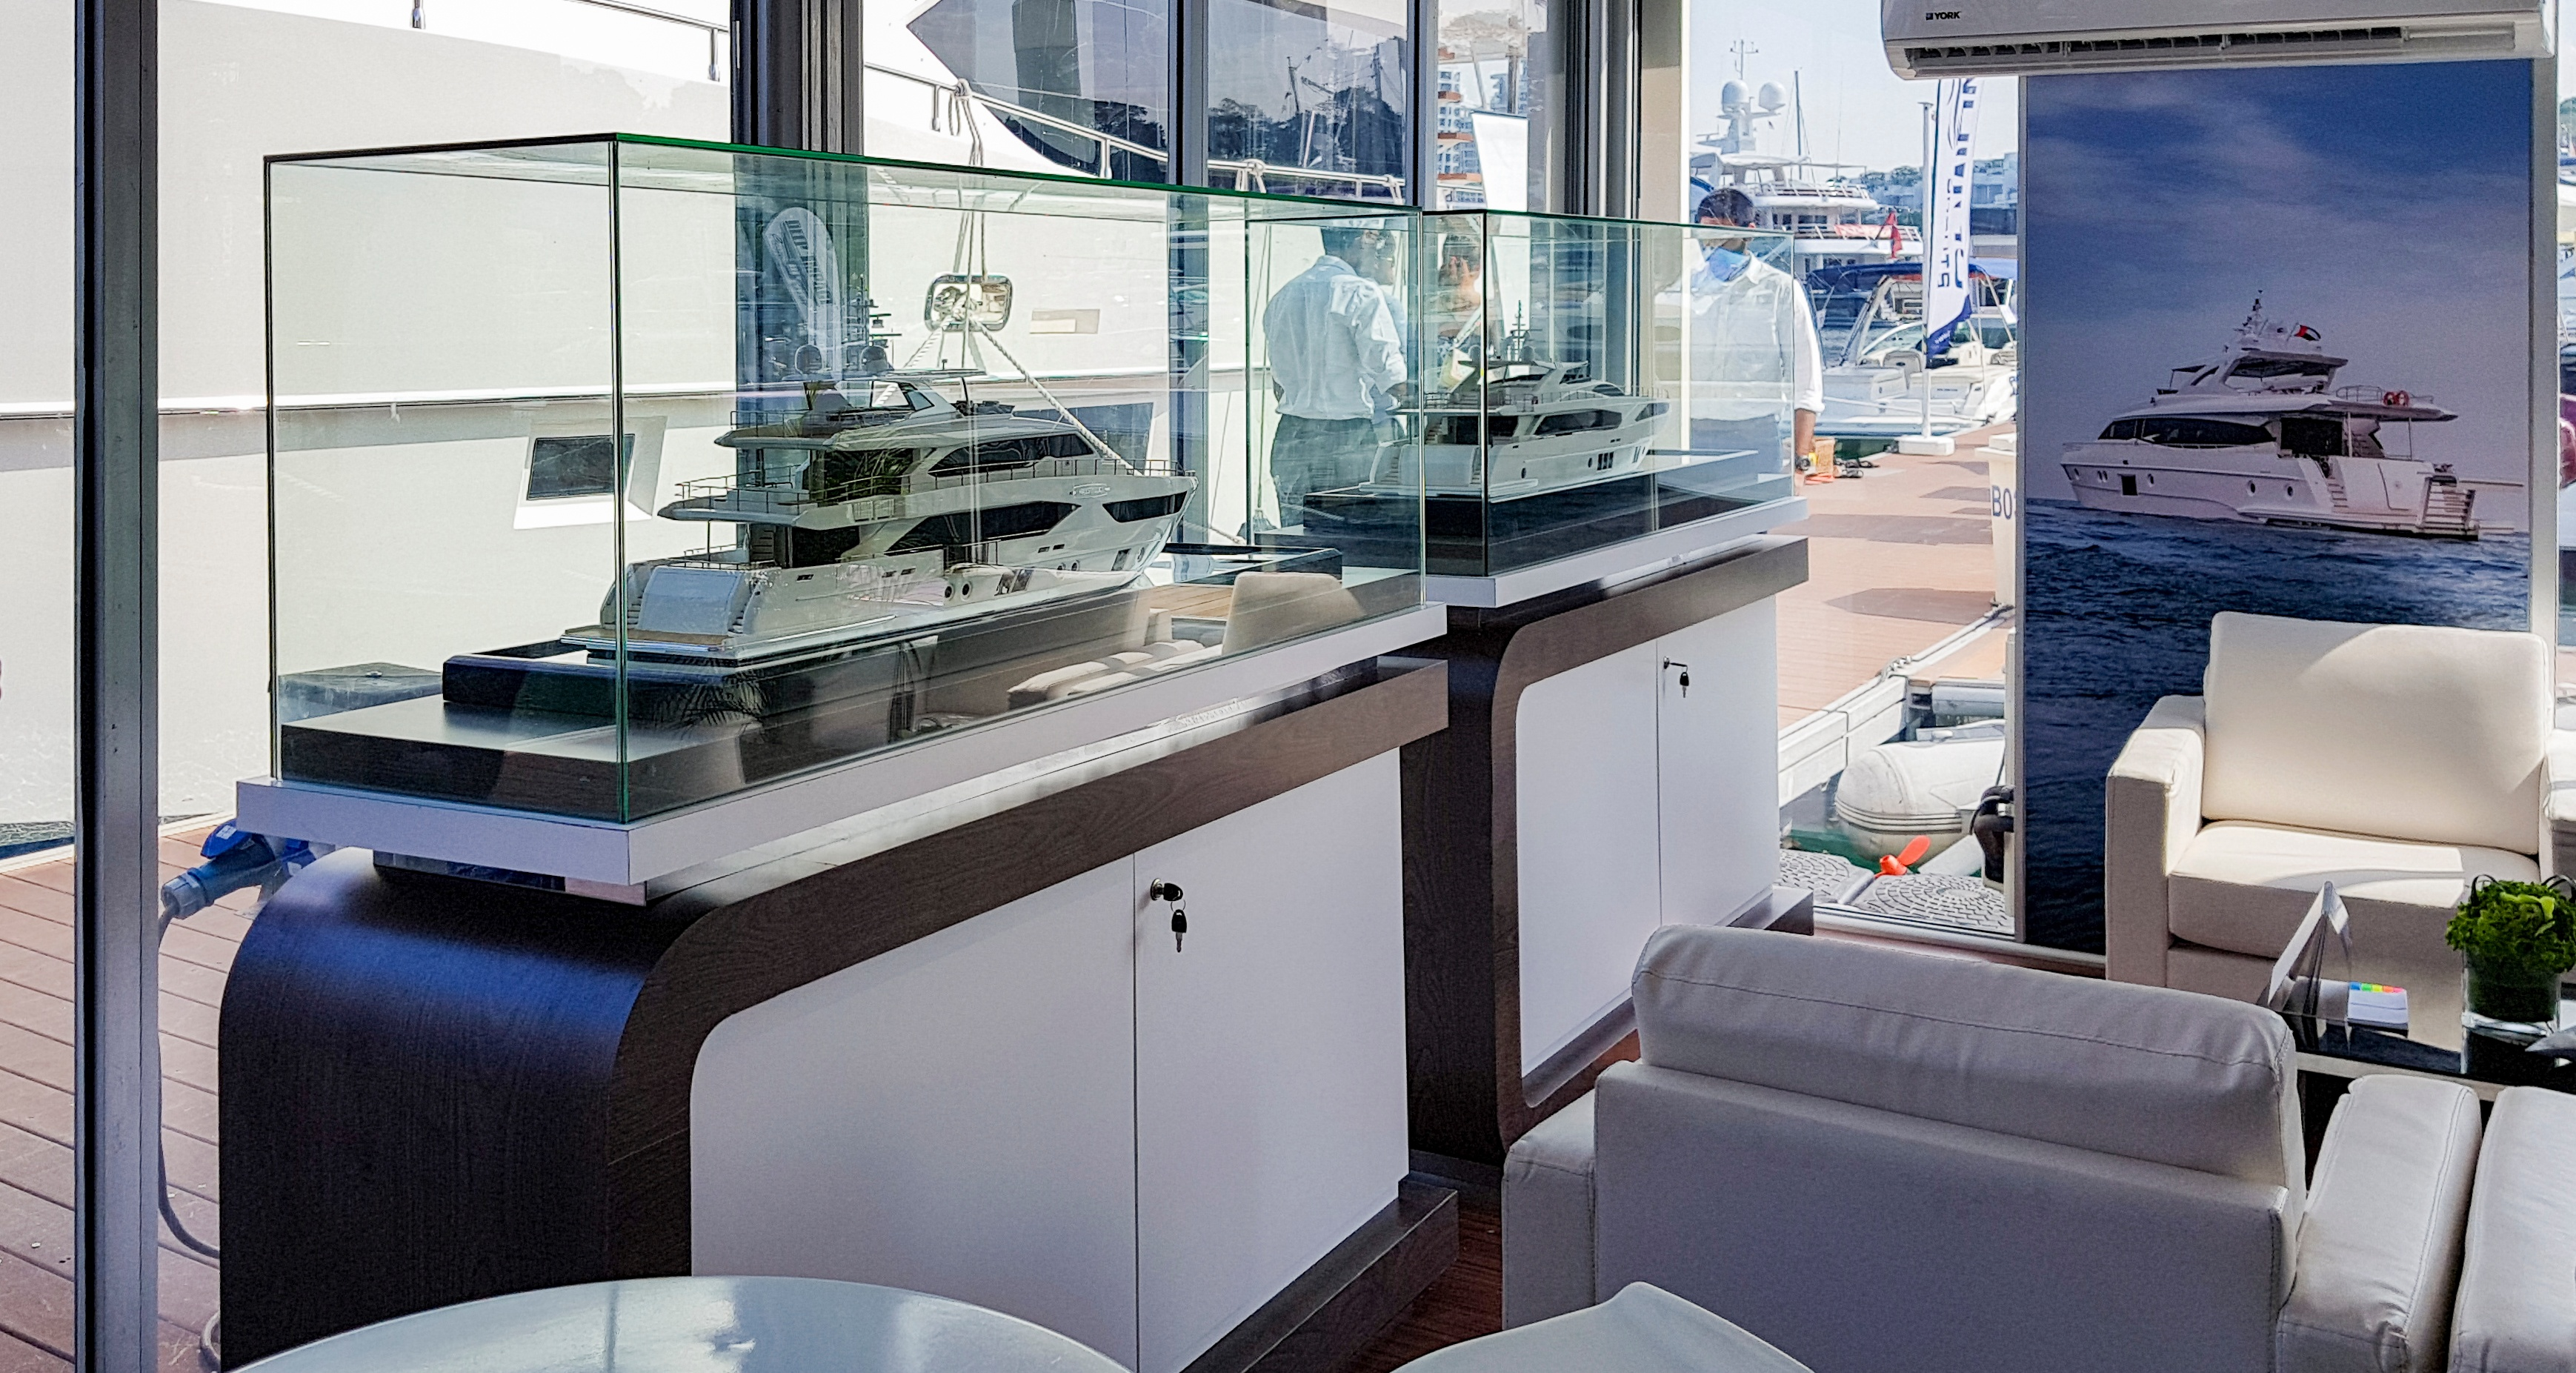 Gulf Craft at Singapore Yacht Show 2018 Day 1 (8).jpg